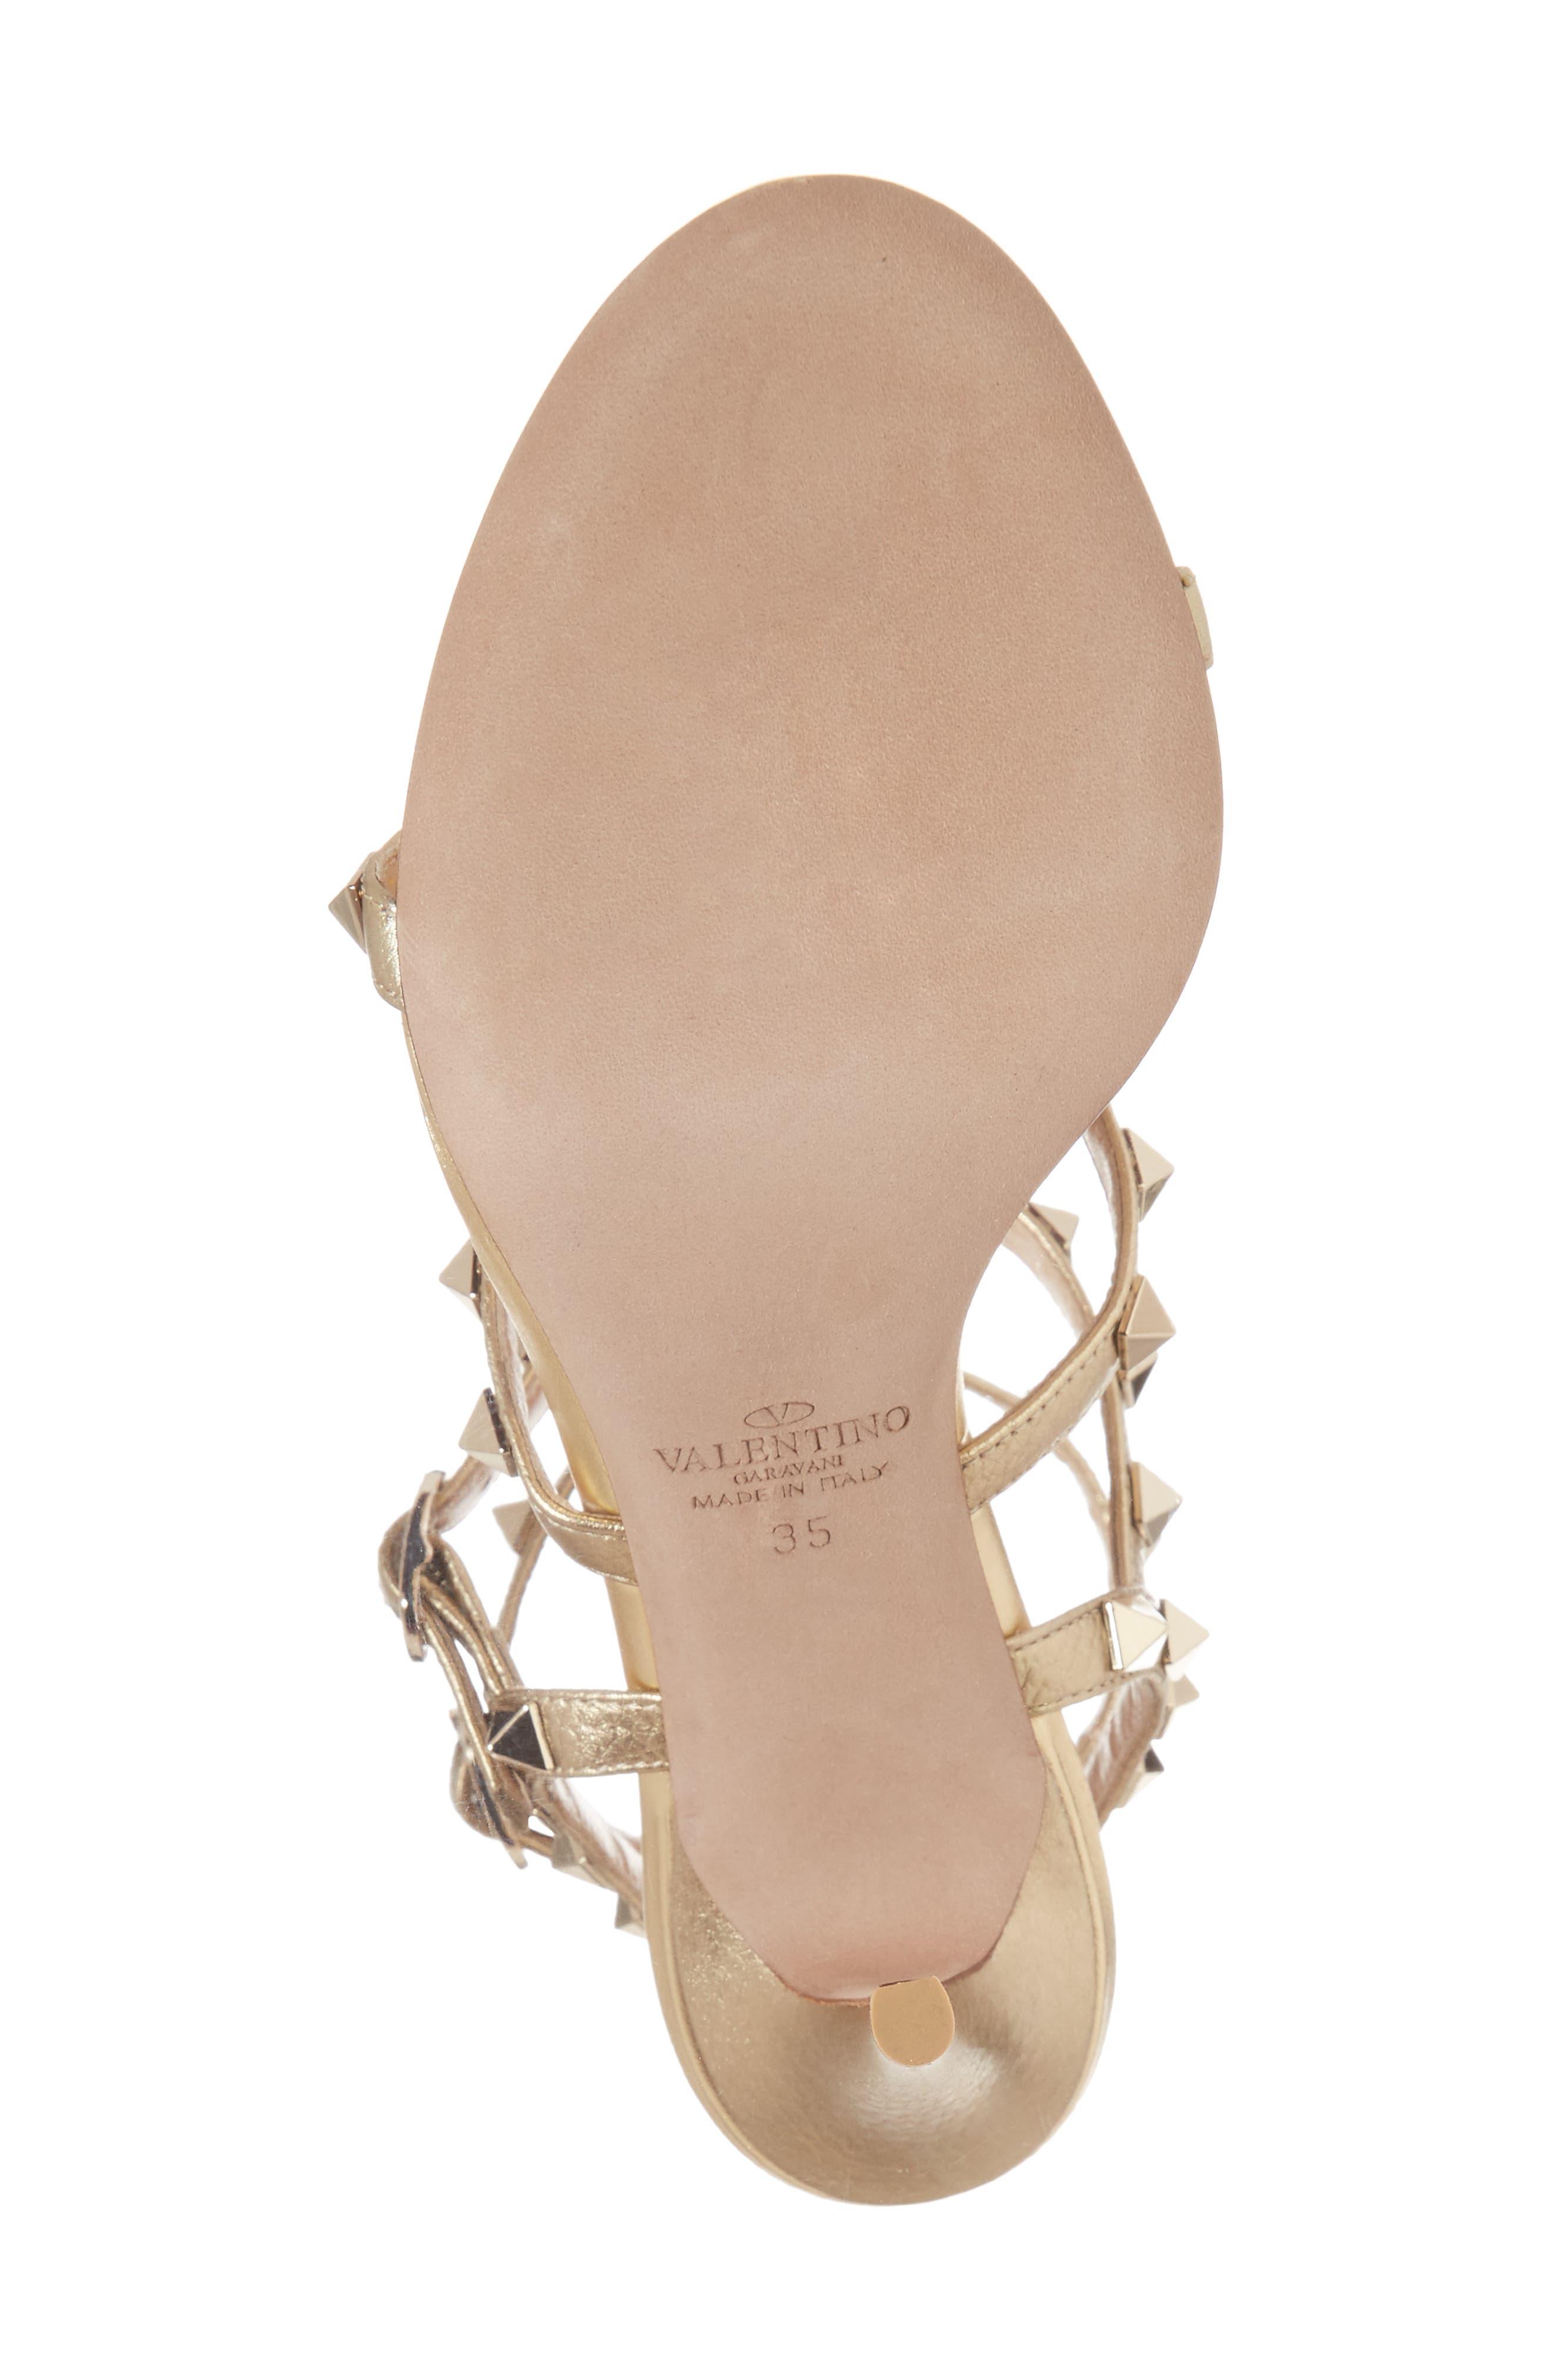 VALENTINO GARAVANI, Rockstud Metallic Ankle Strap Sandal, Alternate thumbnail 6, color, 710